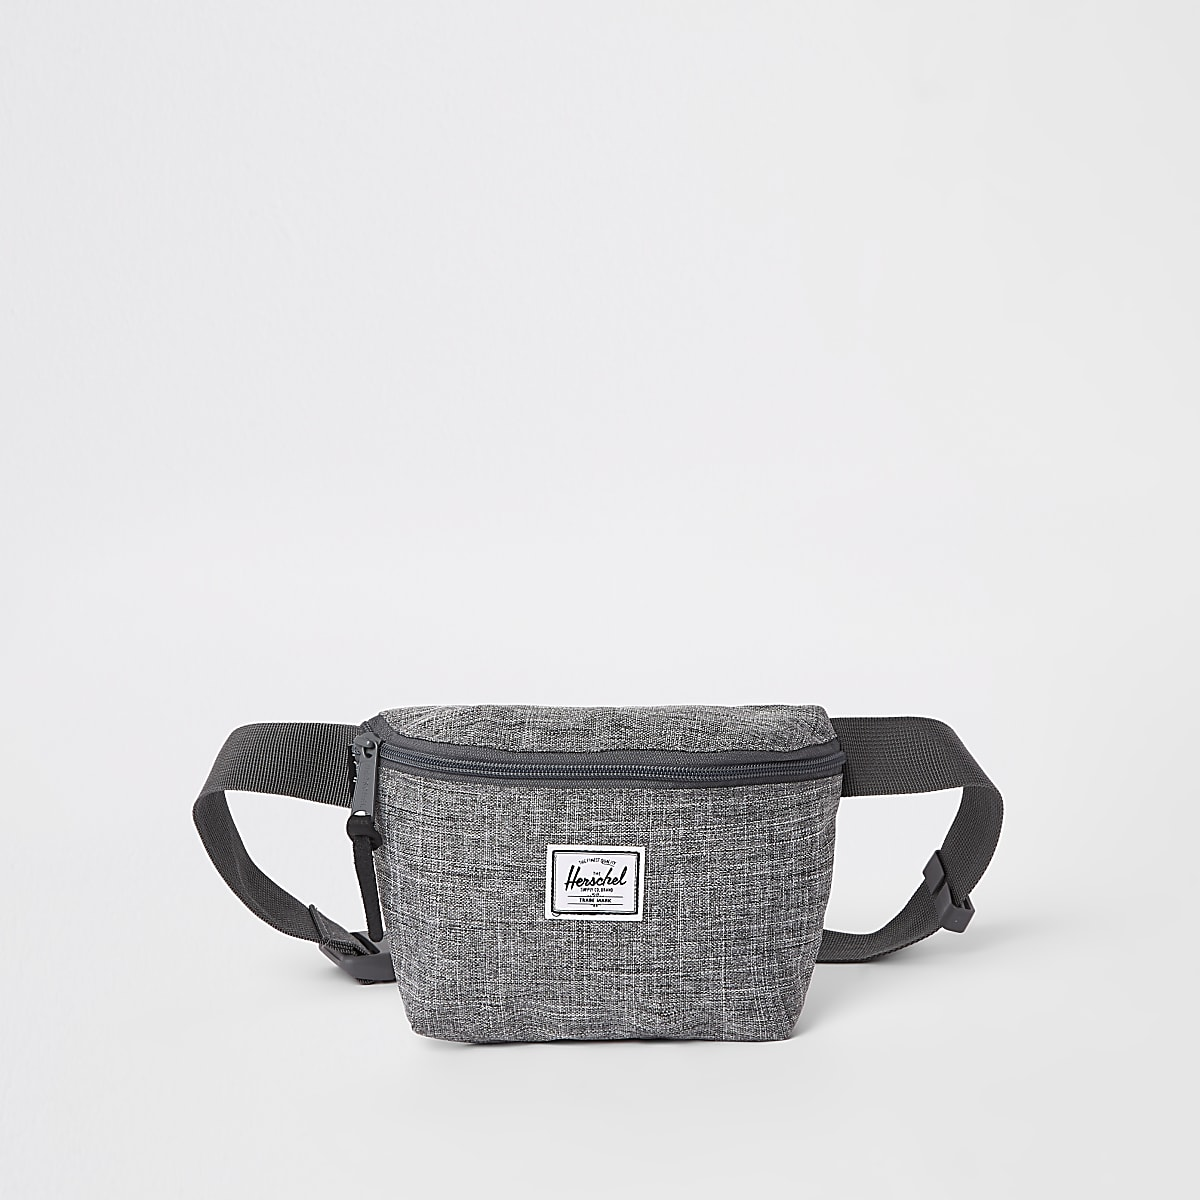 Fourteen Body Grey Cross Herschel Bag Marl E2WDHI9